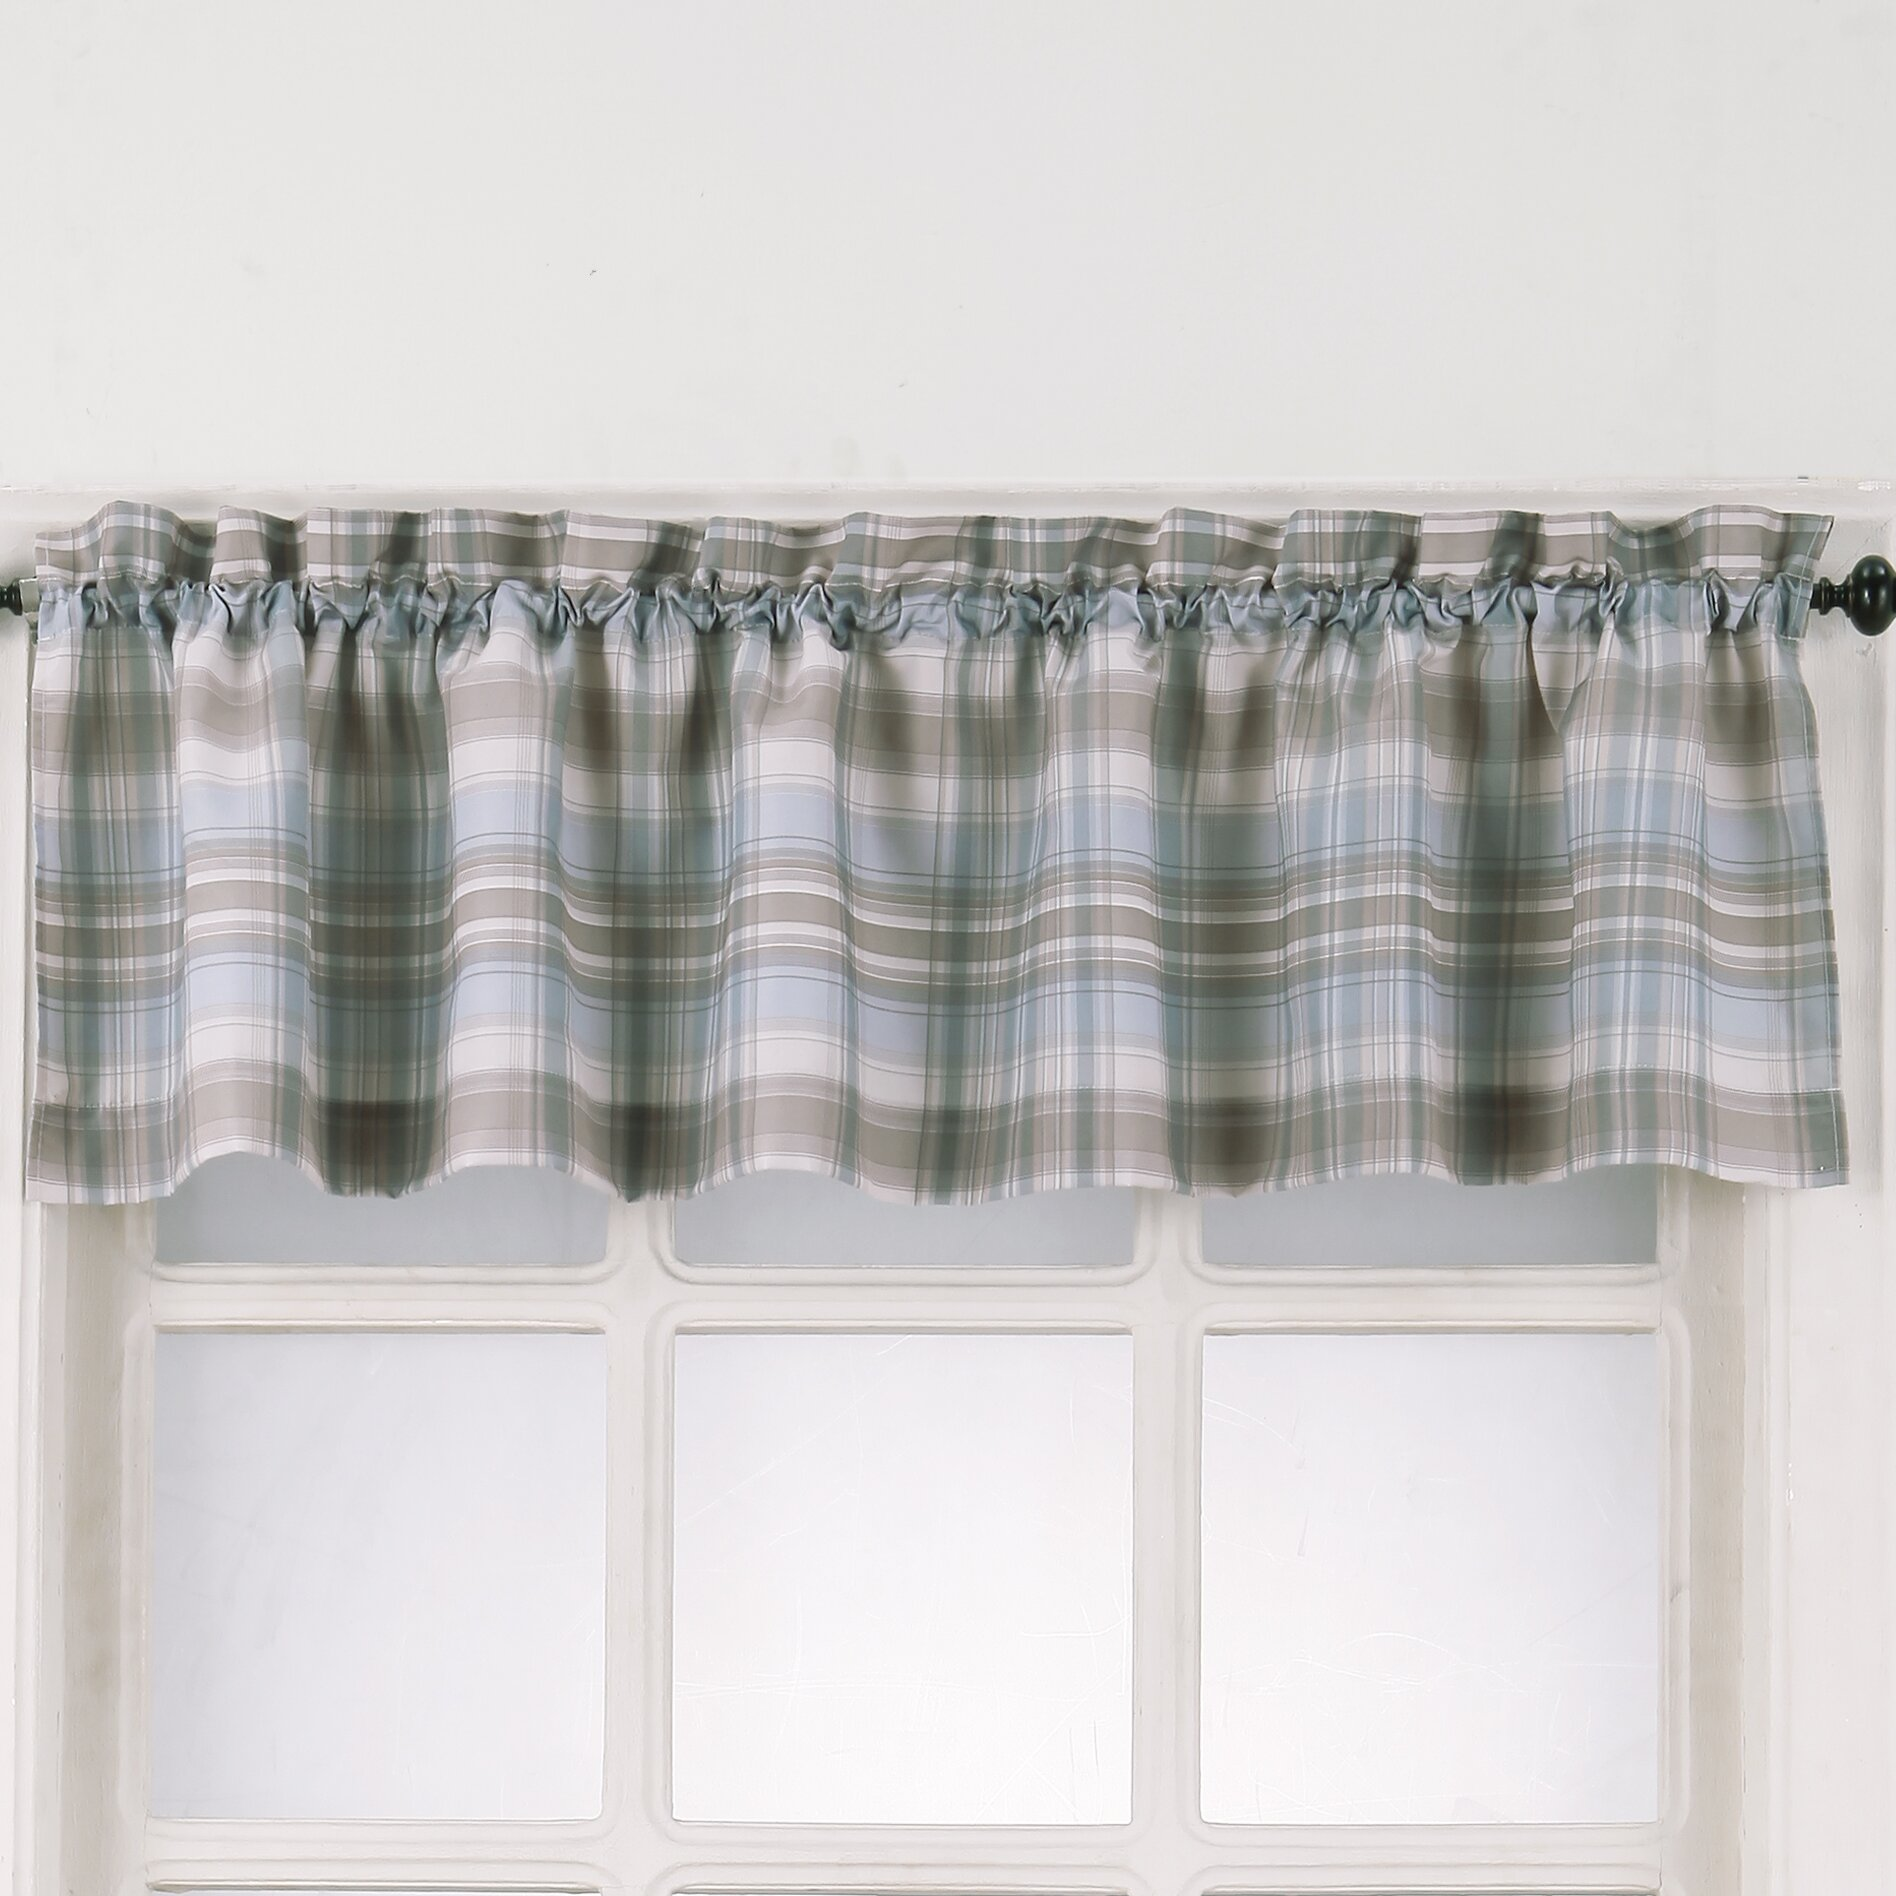 No. 918 Dawson Plaid Rod Pocket Kitchen Curtain Valance